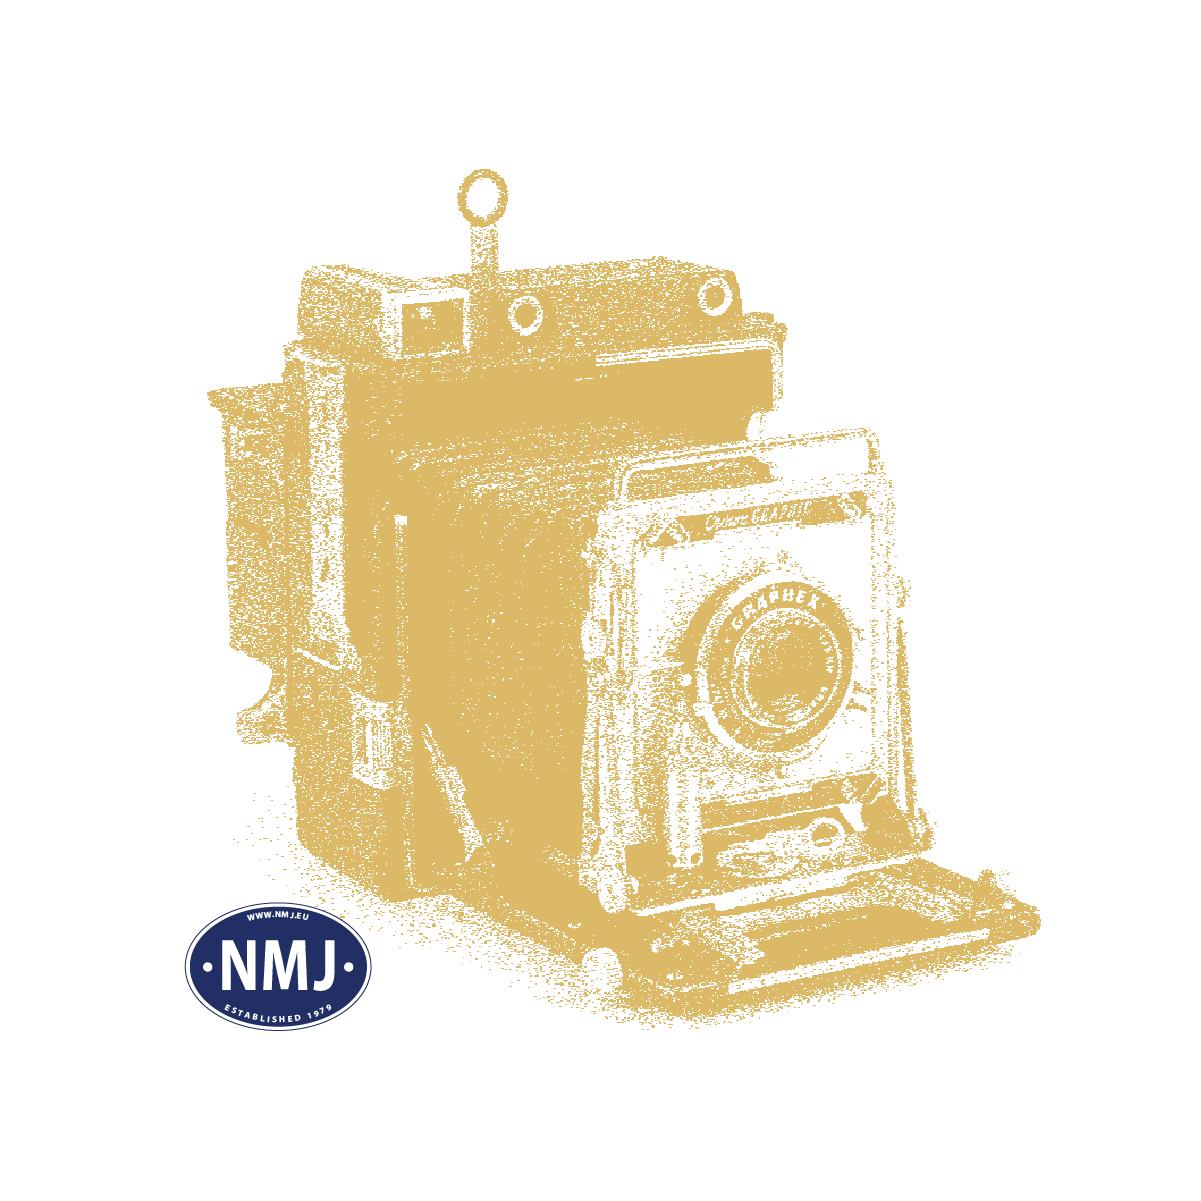 NMJT90101 - NMJ Topline DSB MY 1108, DC